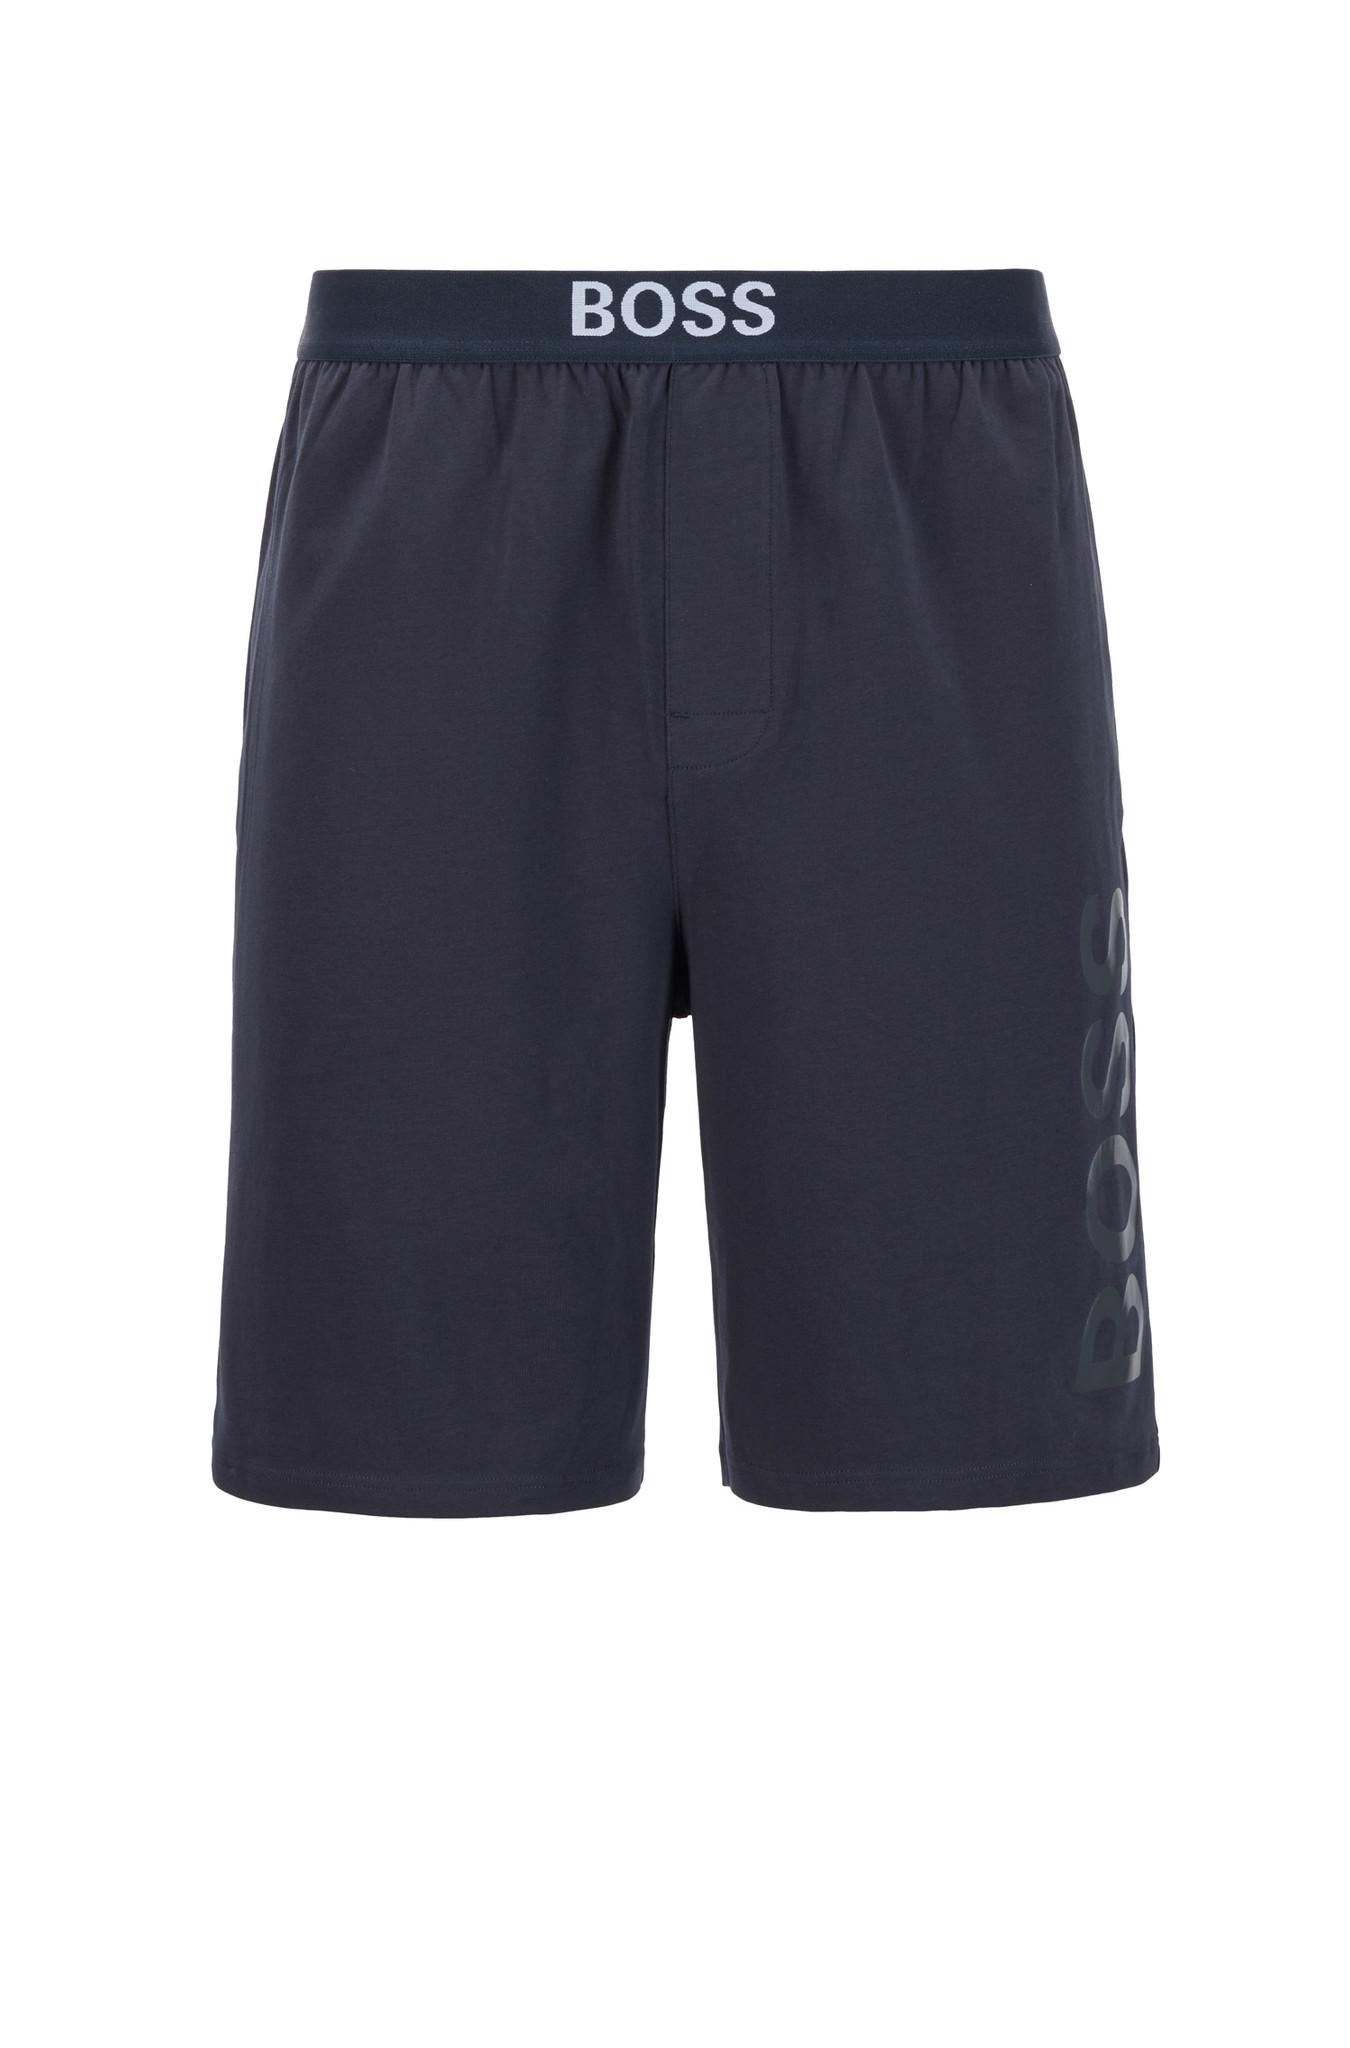 Hugo Boss shorts Hugo Boss 50449829-406